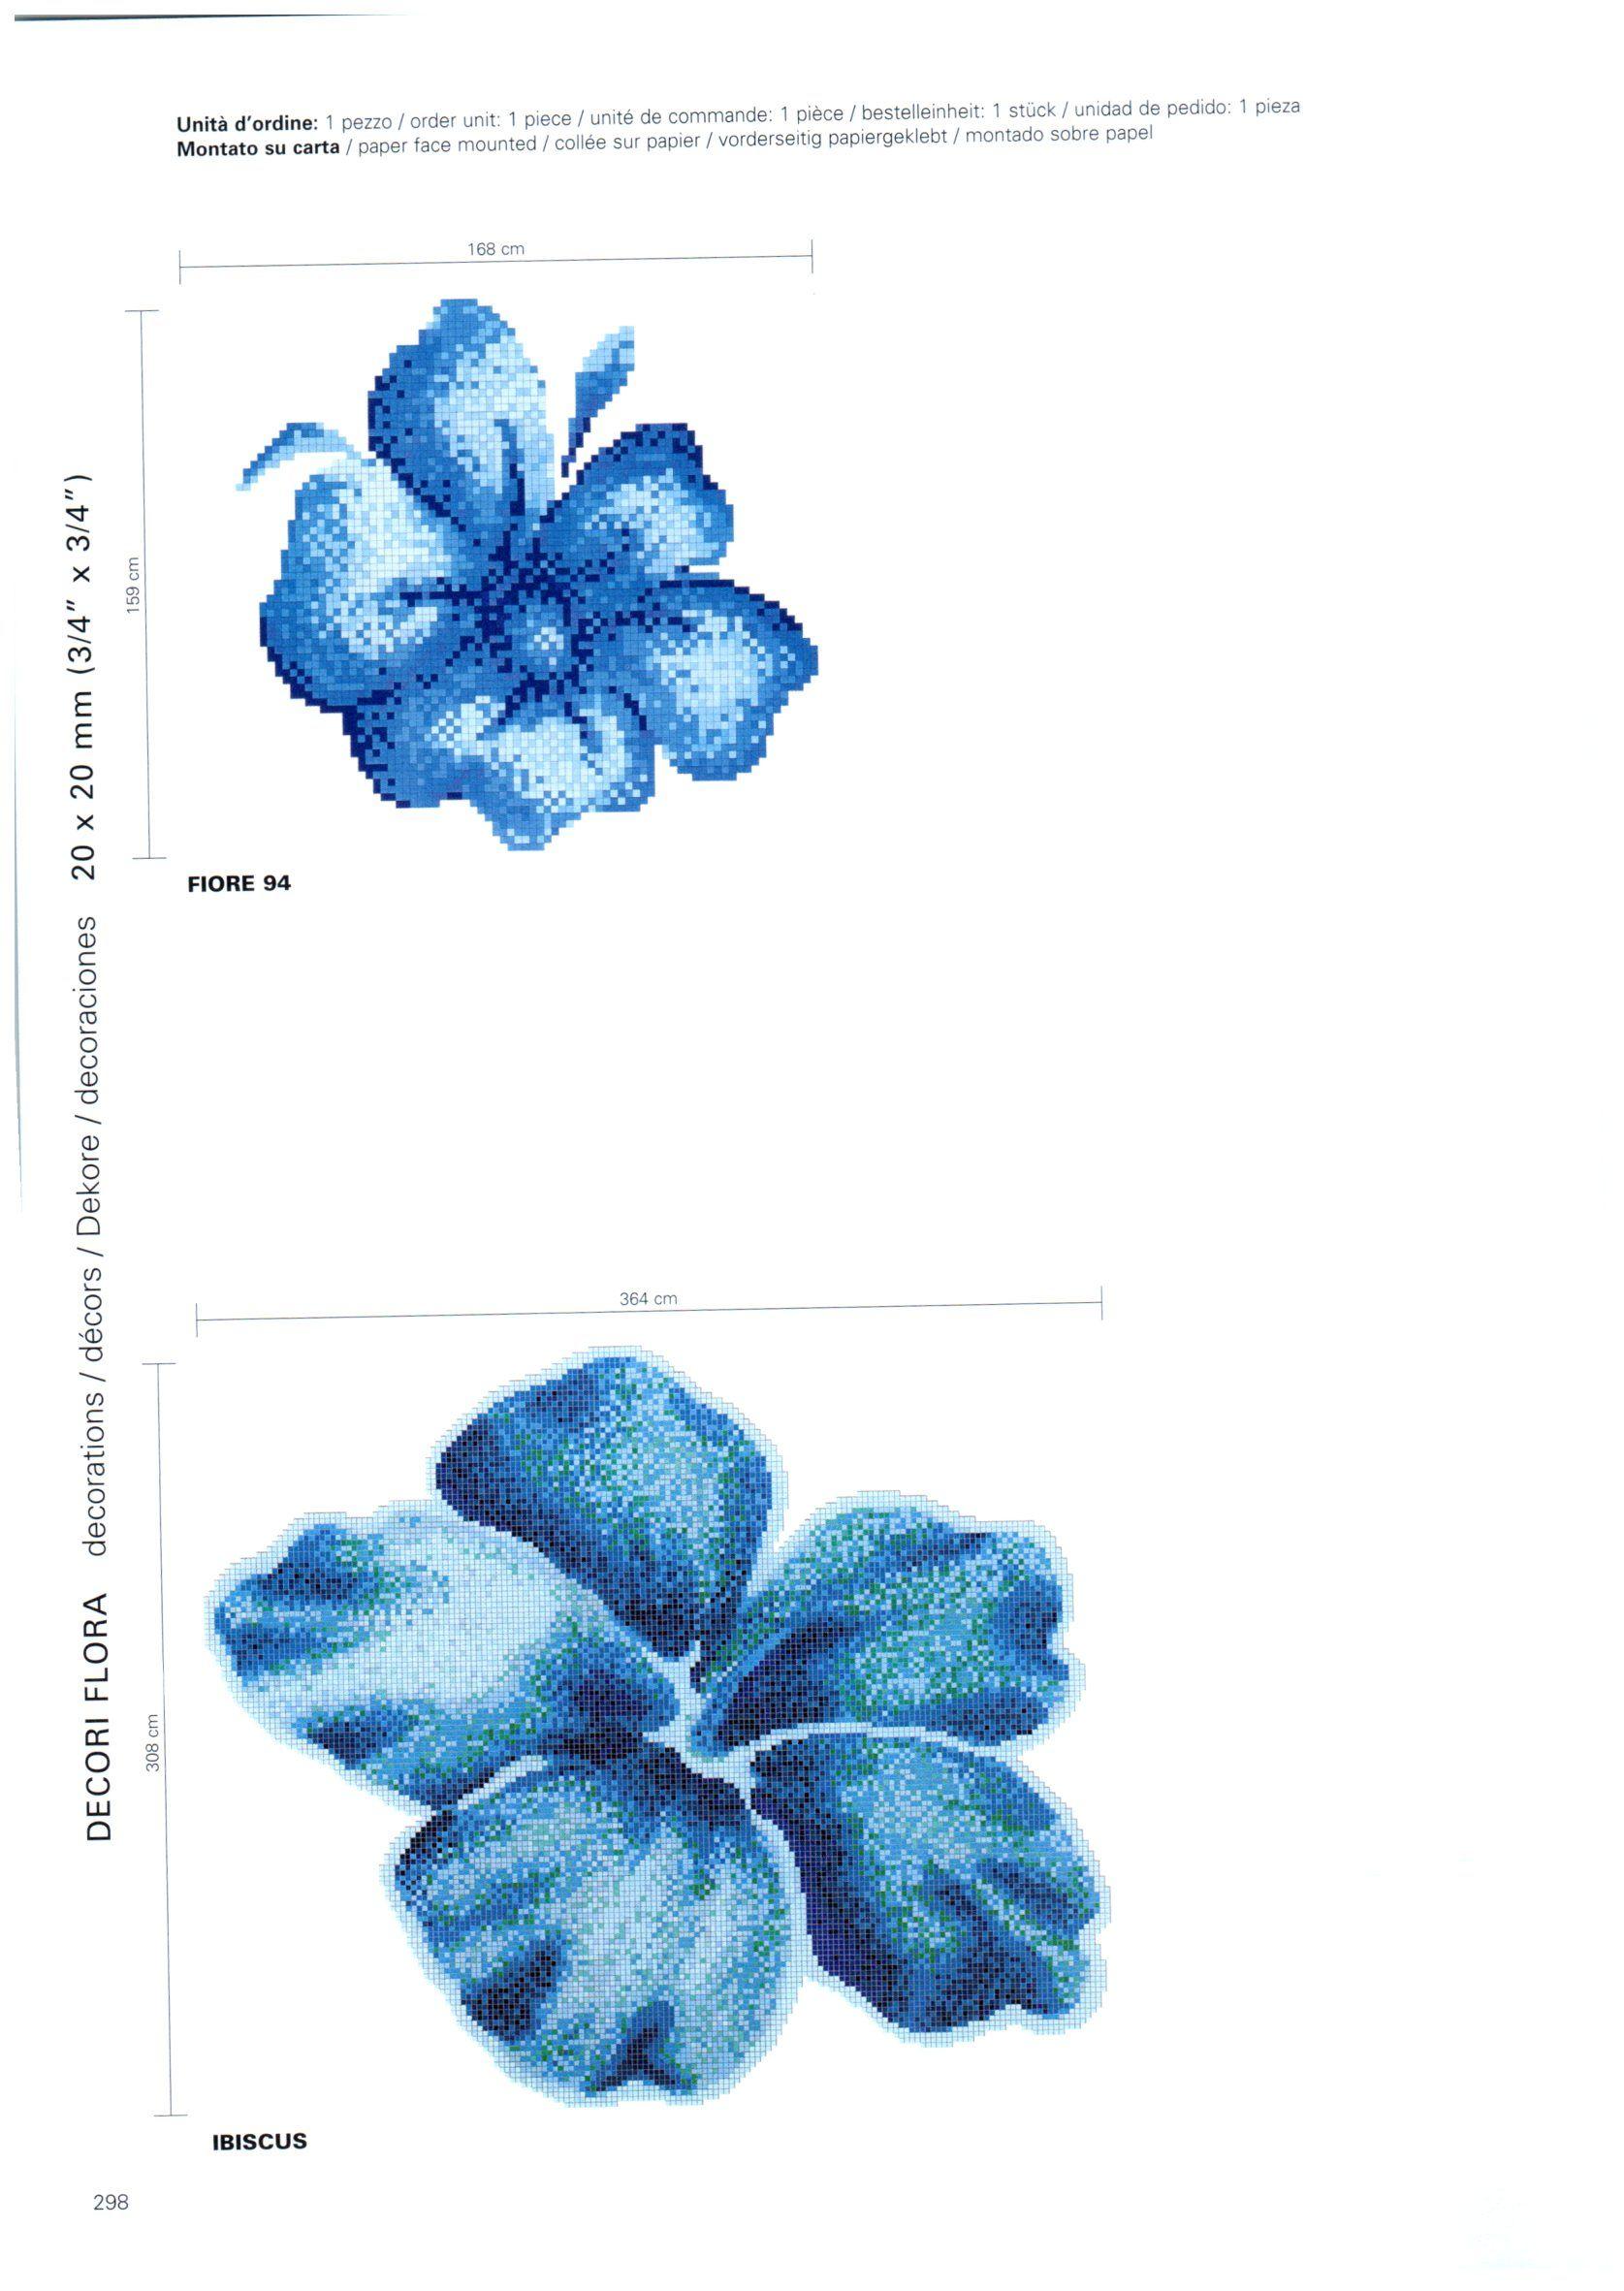 Fiore 94 Bisazza.Bisazza Ibiscus 20x20mm Mosaic Tiles Mosaic Tile Supplies